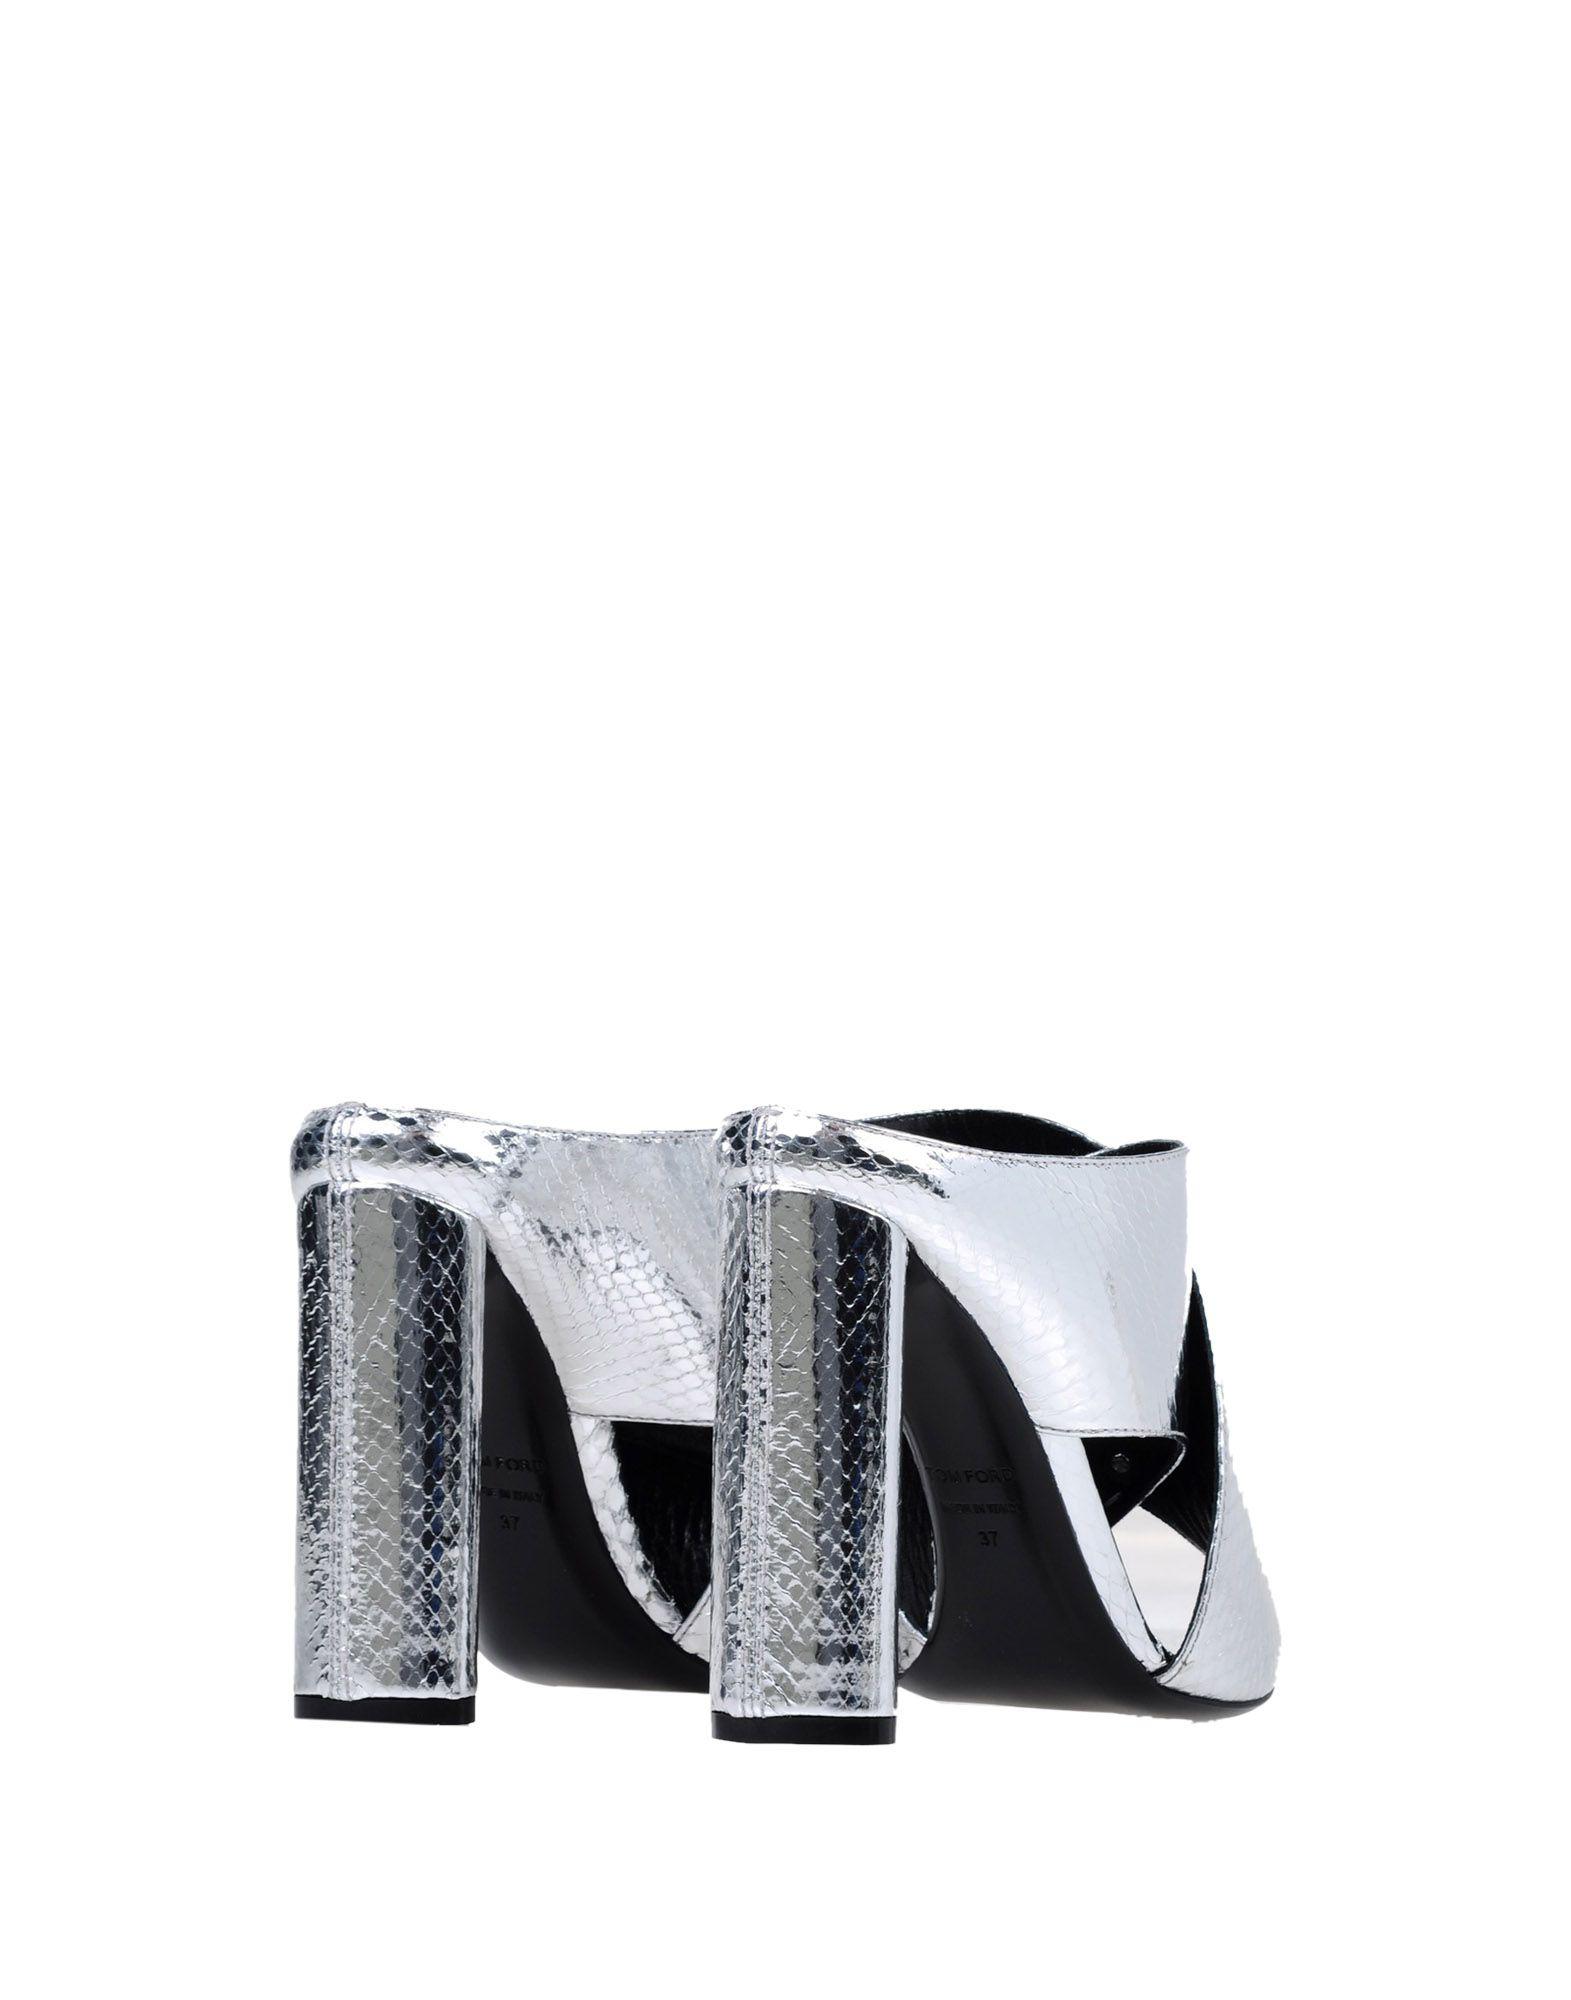 Tom Ford Sandalen Damen  11362604MK Neue Schuhe Schuhe Neue e958e4